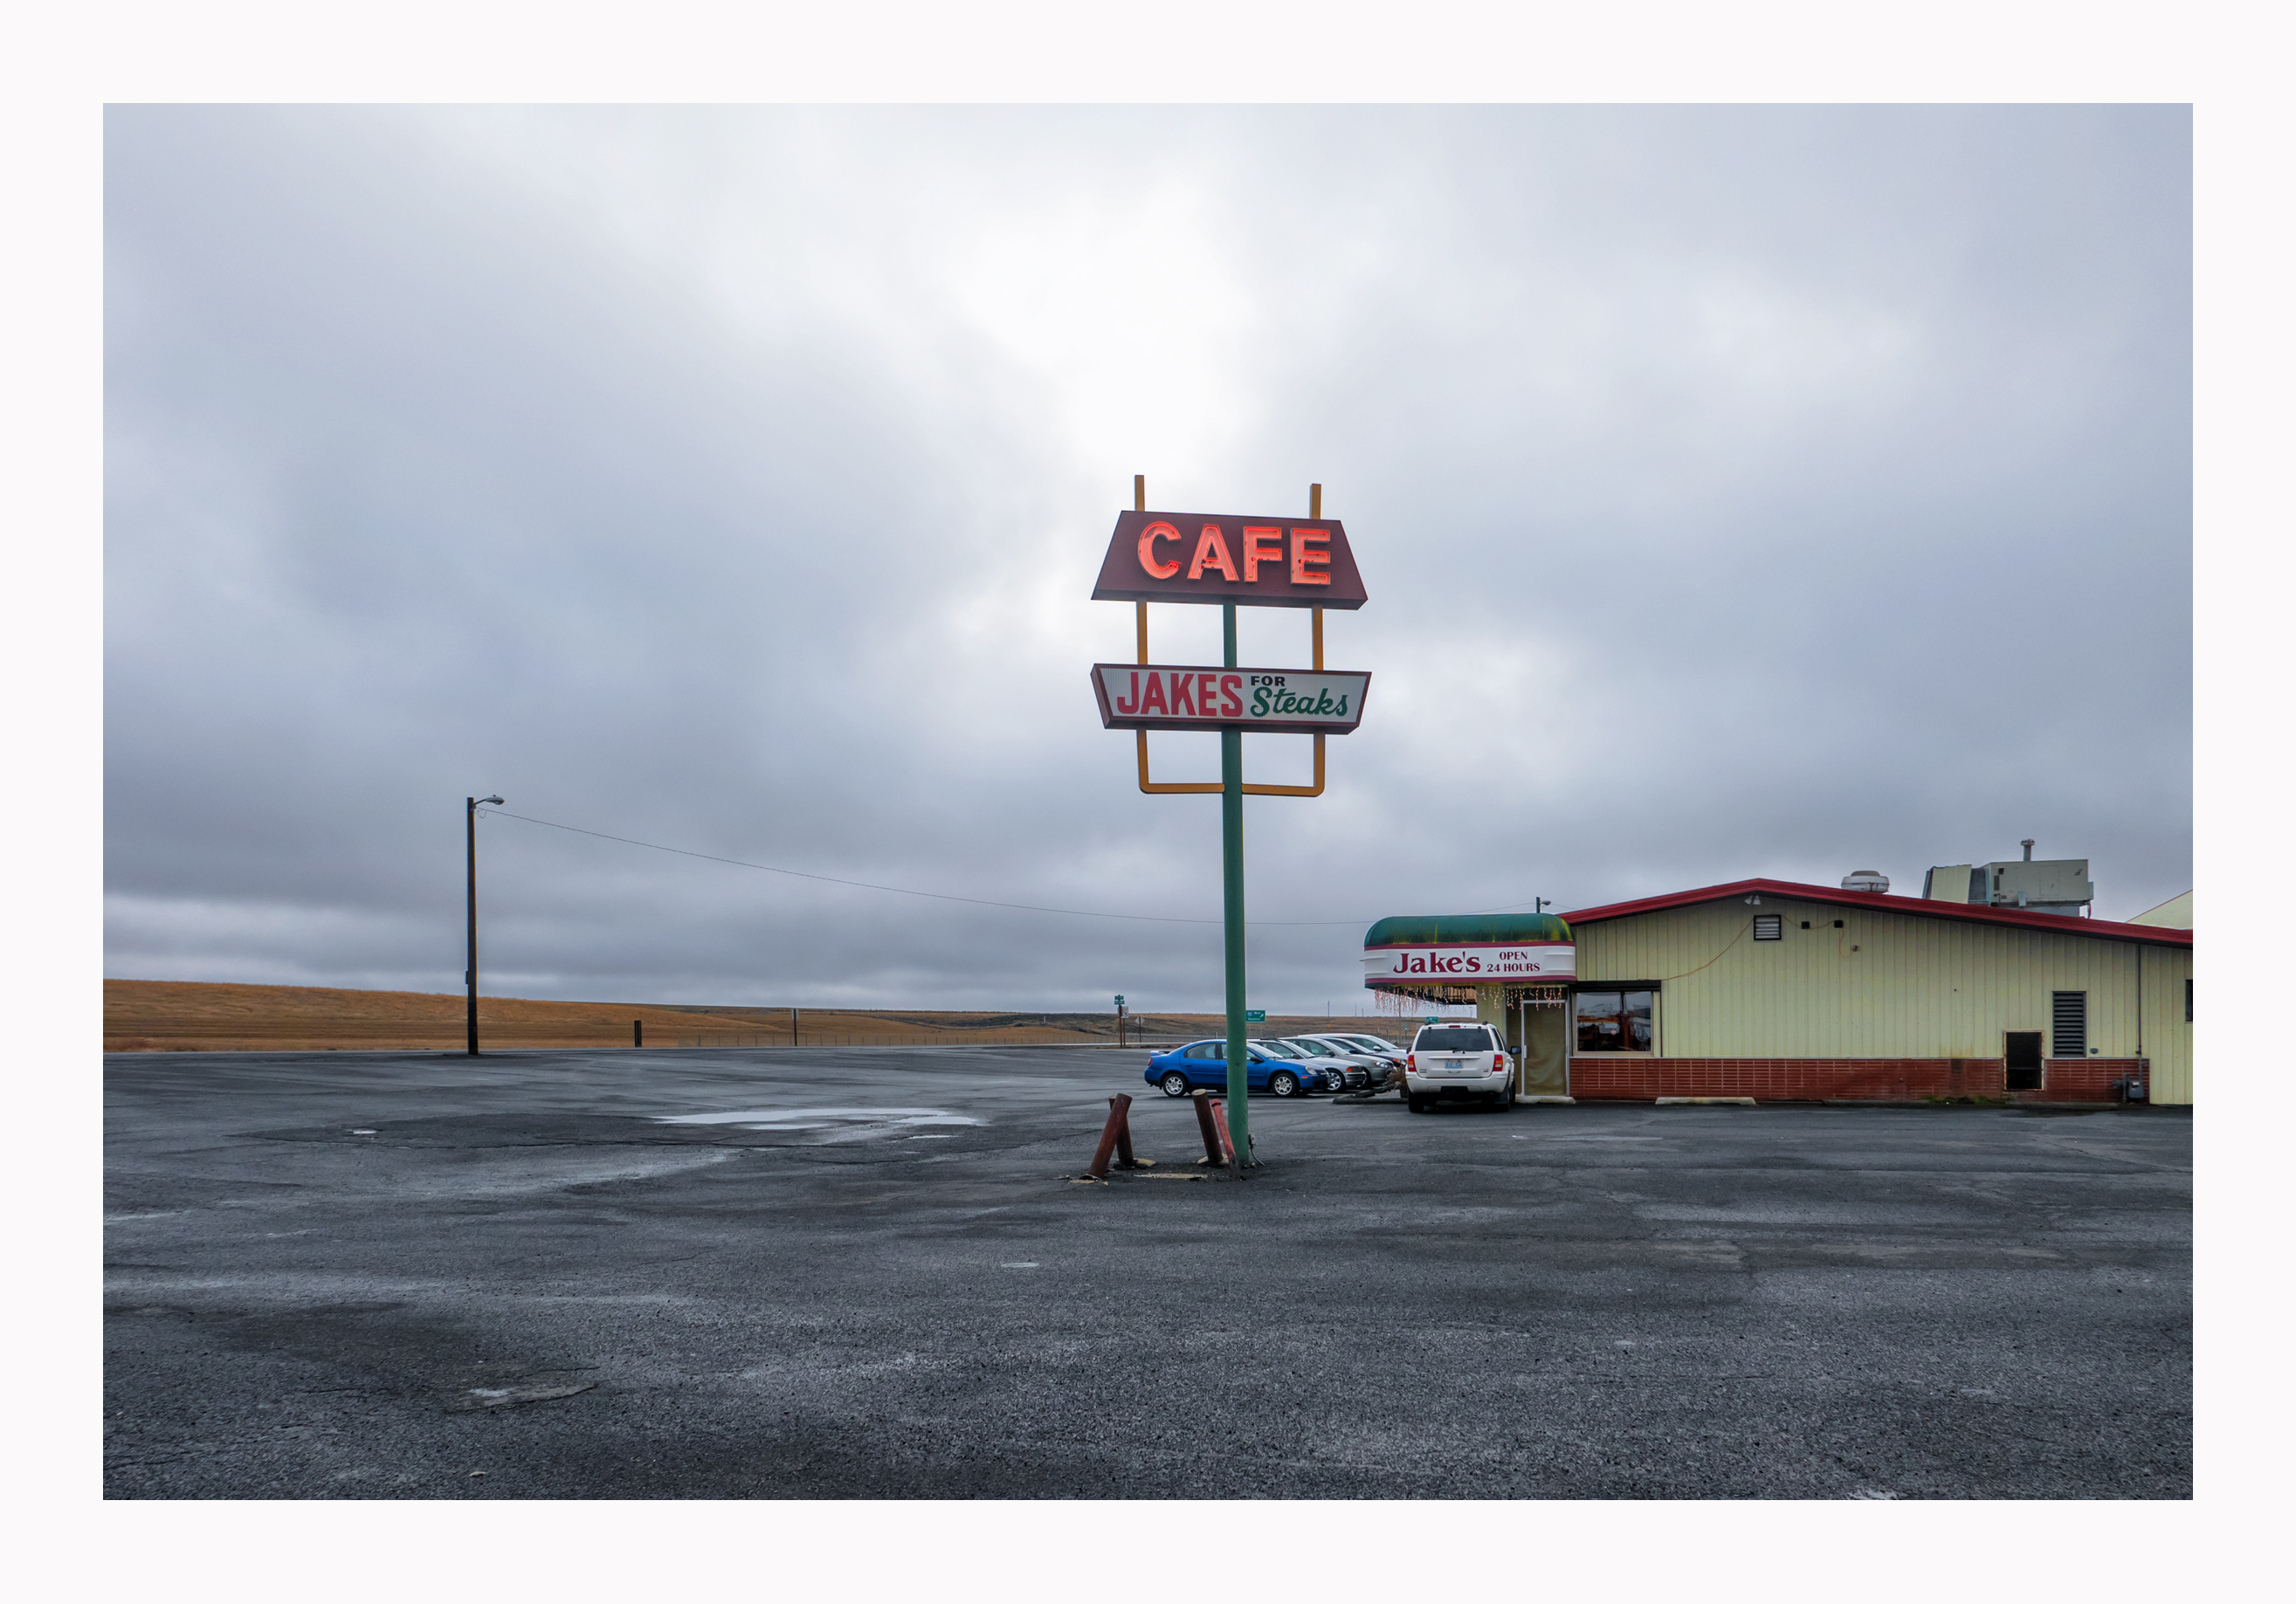 Jake's Cafe - 1604 West 1st Avenue, Ritzville, Washington U.S.A. - December 24, 2014